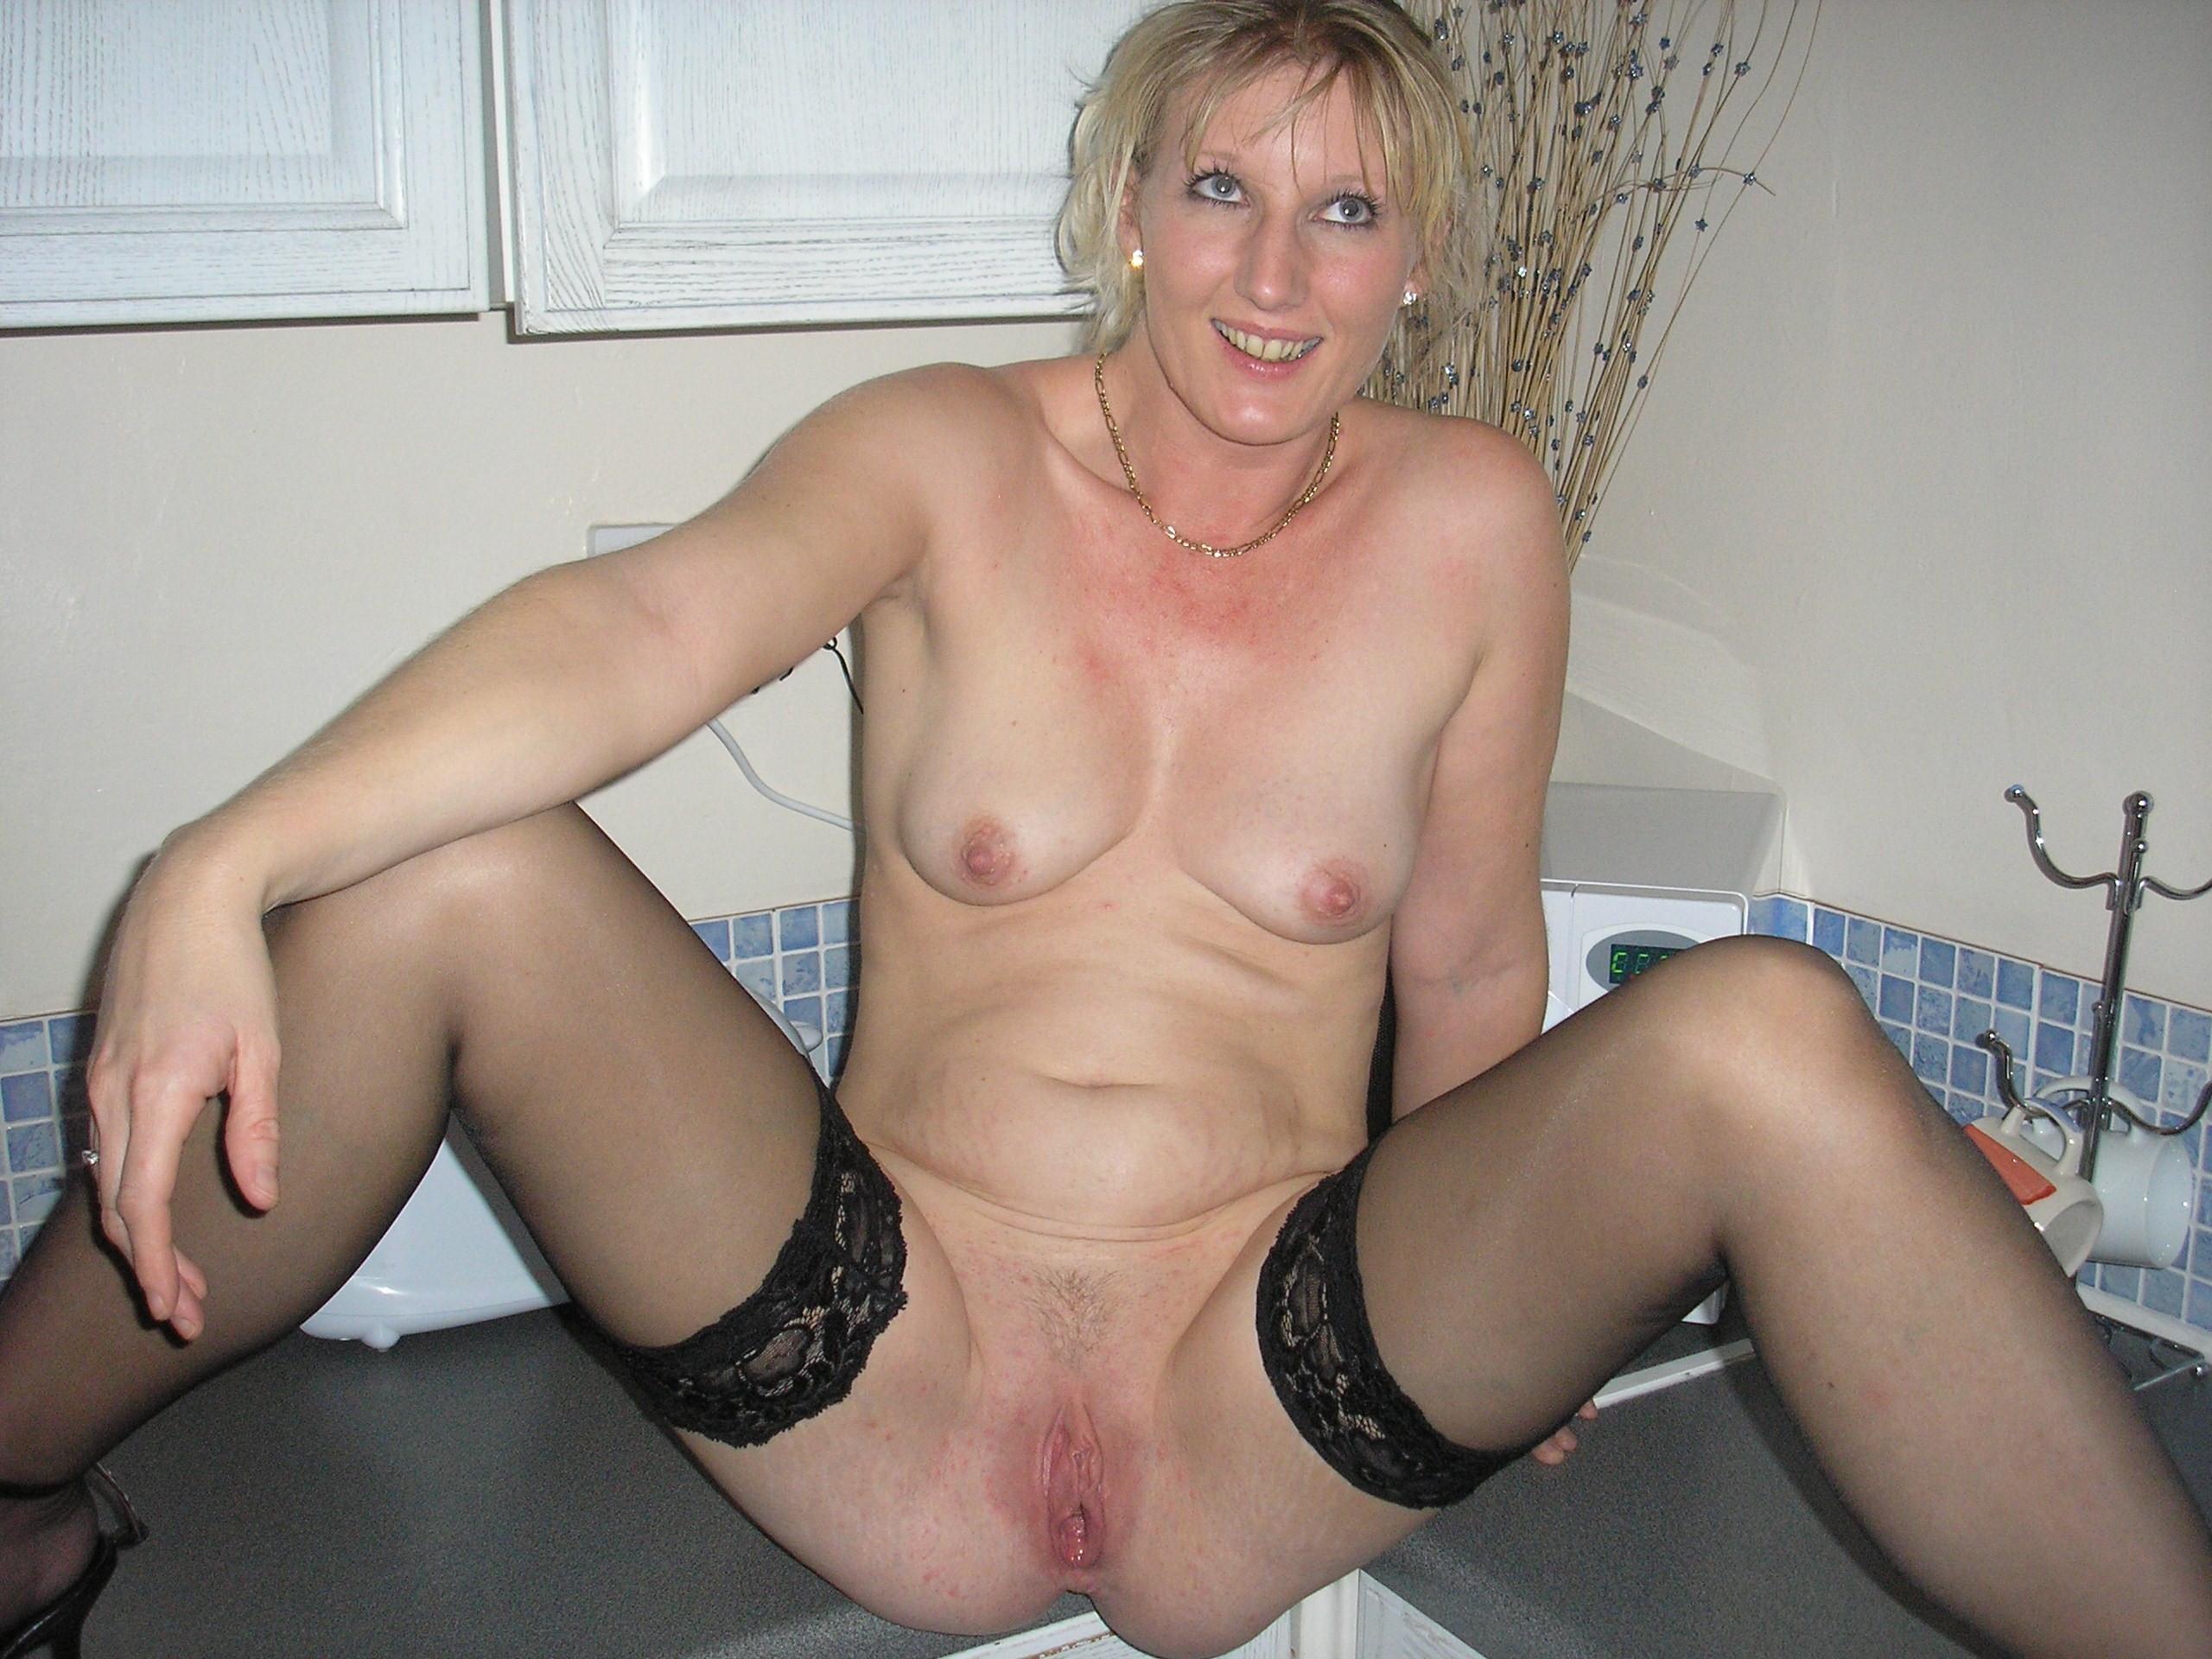 high quality nude massage video